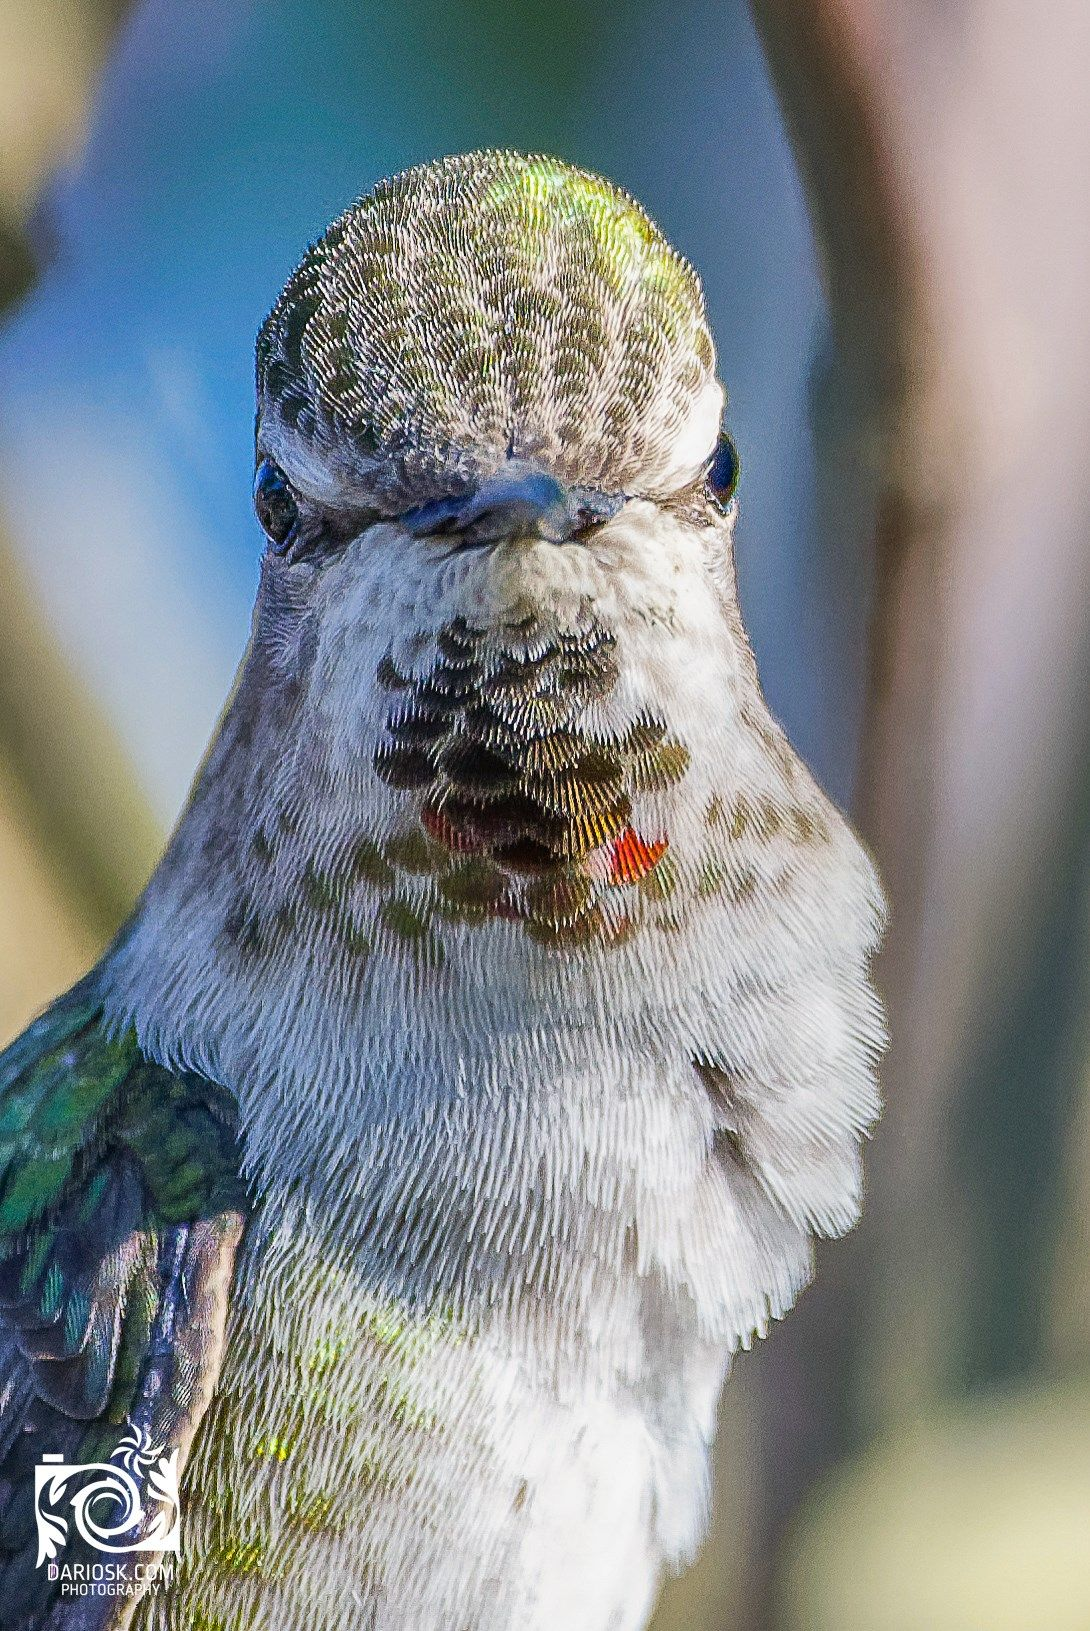 Annas hummingbird looking at you, Richmond, BC, Canada